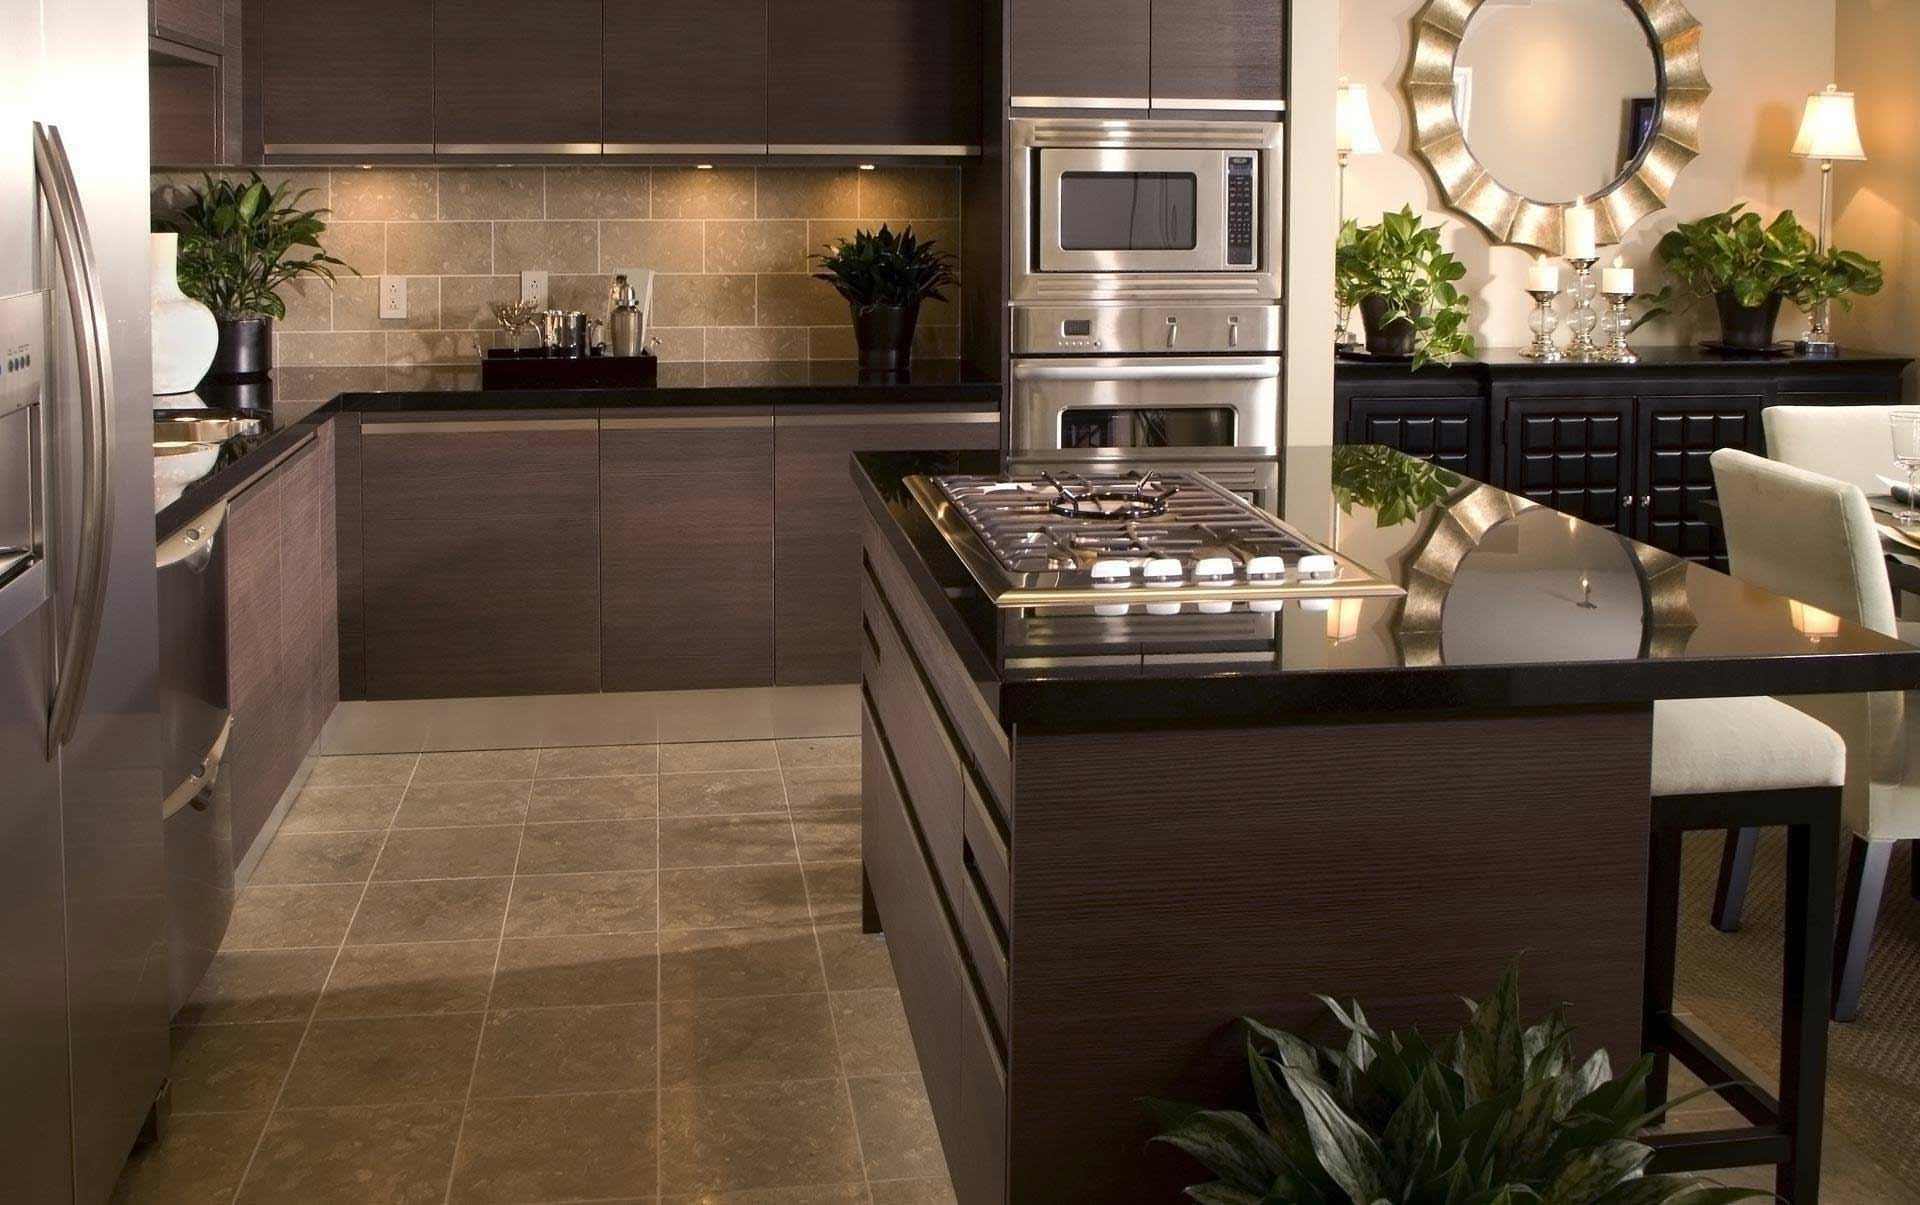 Top 65 luxury kitchen design ideas exclusive gallery home luxury kitchen wall tiles dailygadgetfo Choice Image